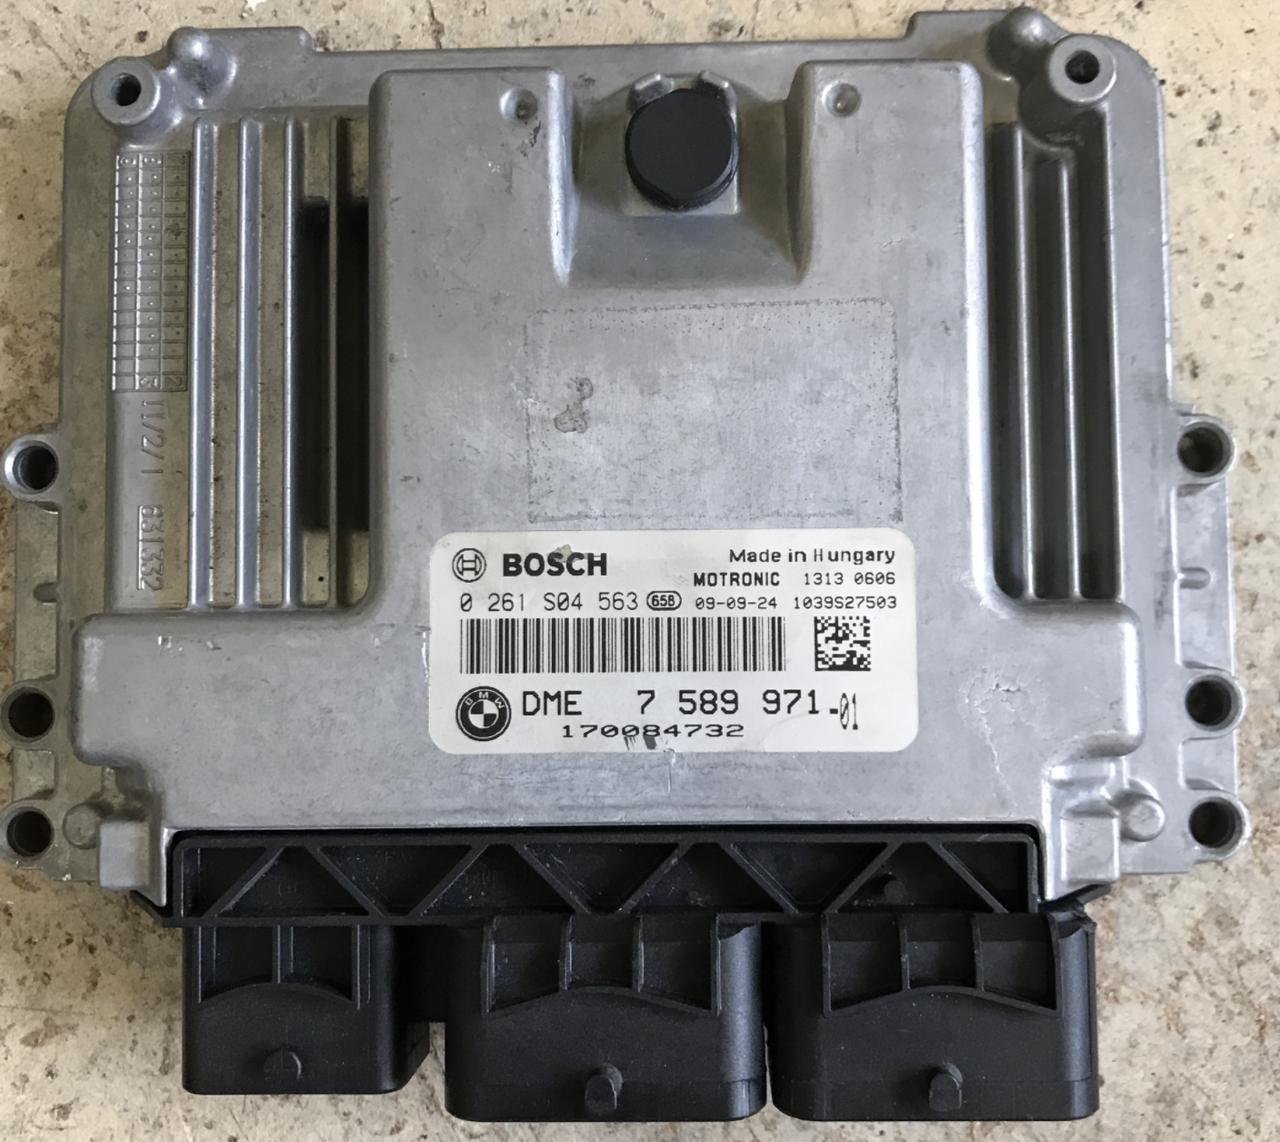 Plug & Play Bosch Engine ECU, Mini Cooper/One, 0261S04563, 0 261 S04 563,  DME7589971, DME 7 589 971